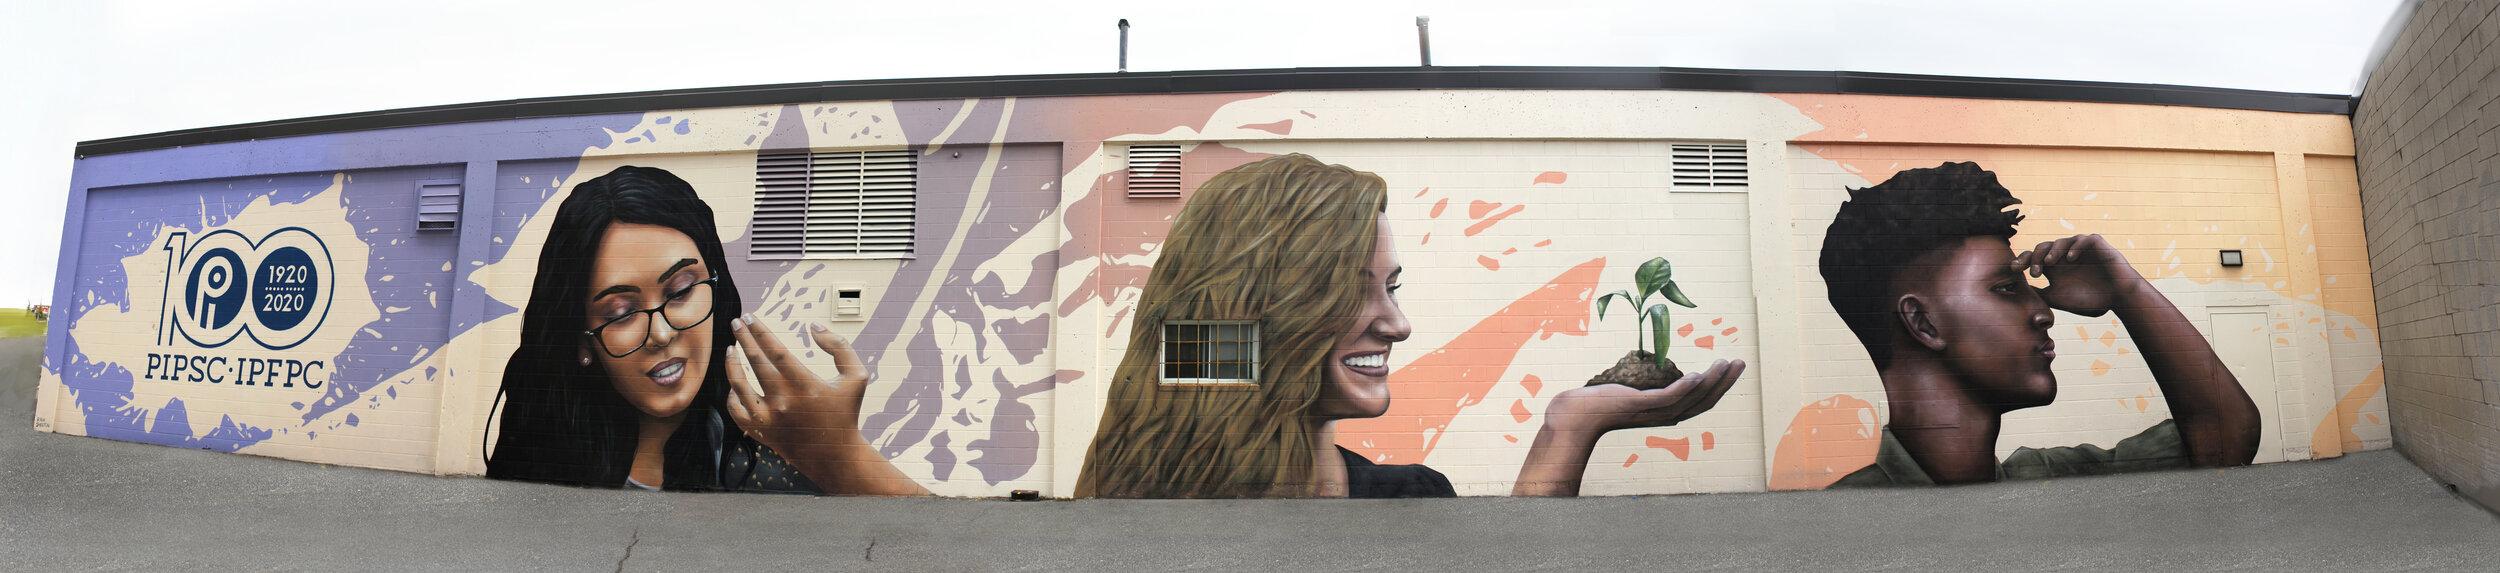 Mural for PIPSC